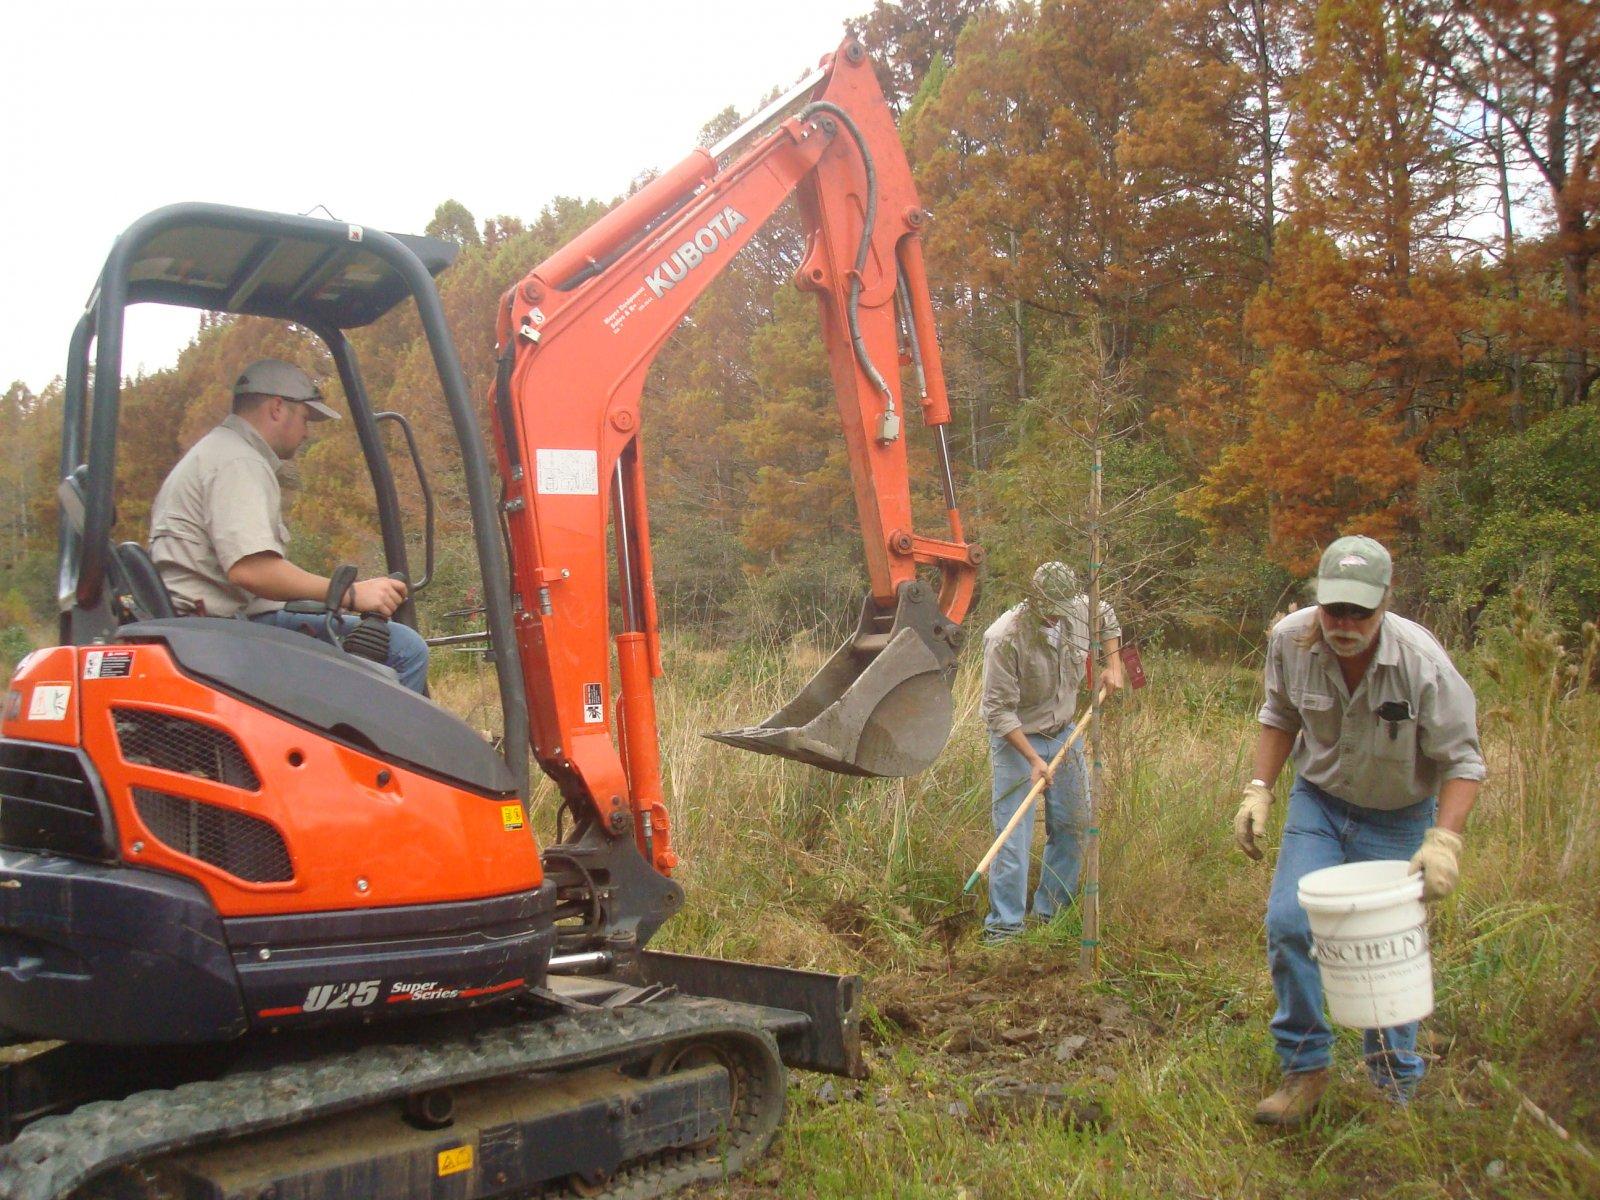 Click image for larger version  Name:Tree Planting Nov 8 12 503.jpg Views:69 Size:402.1 KB ID:172544